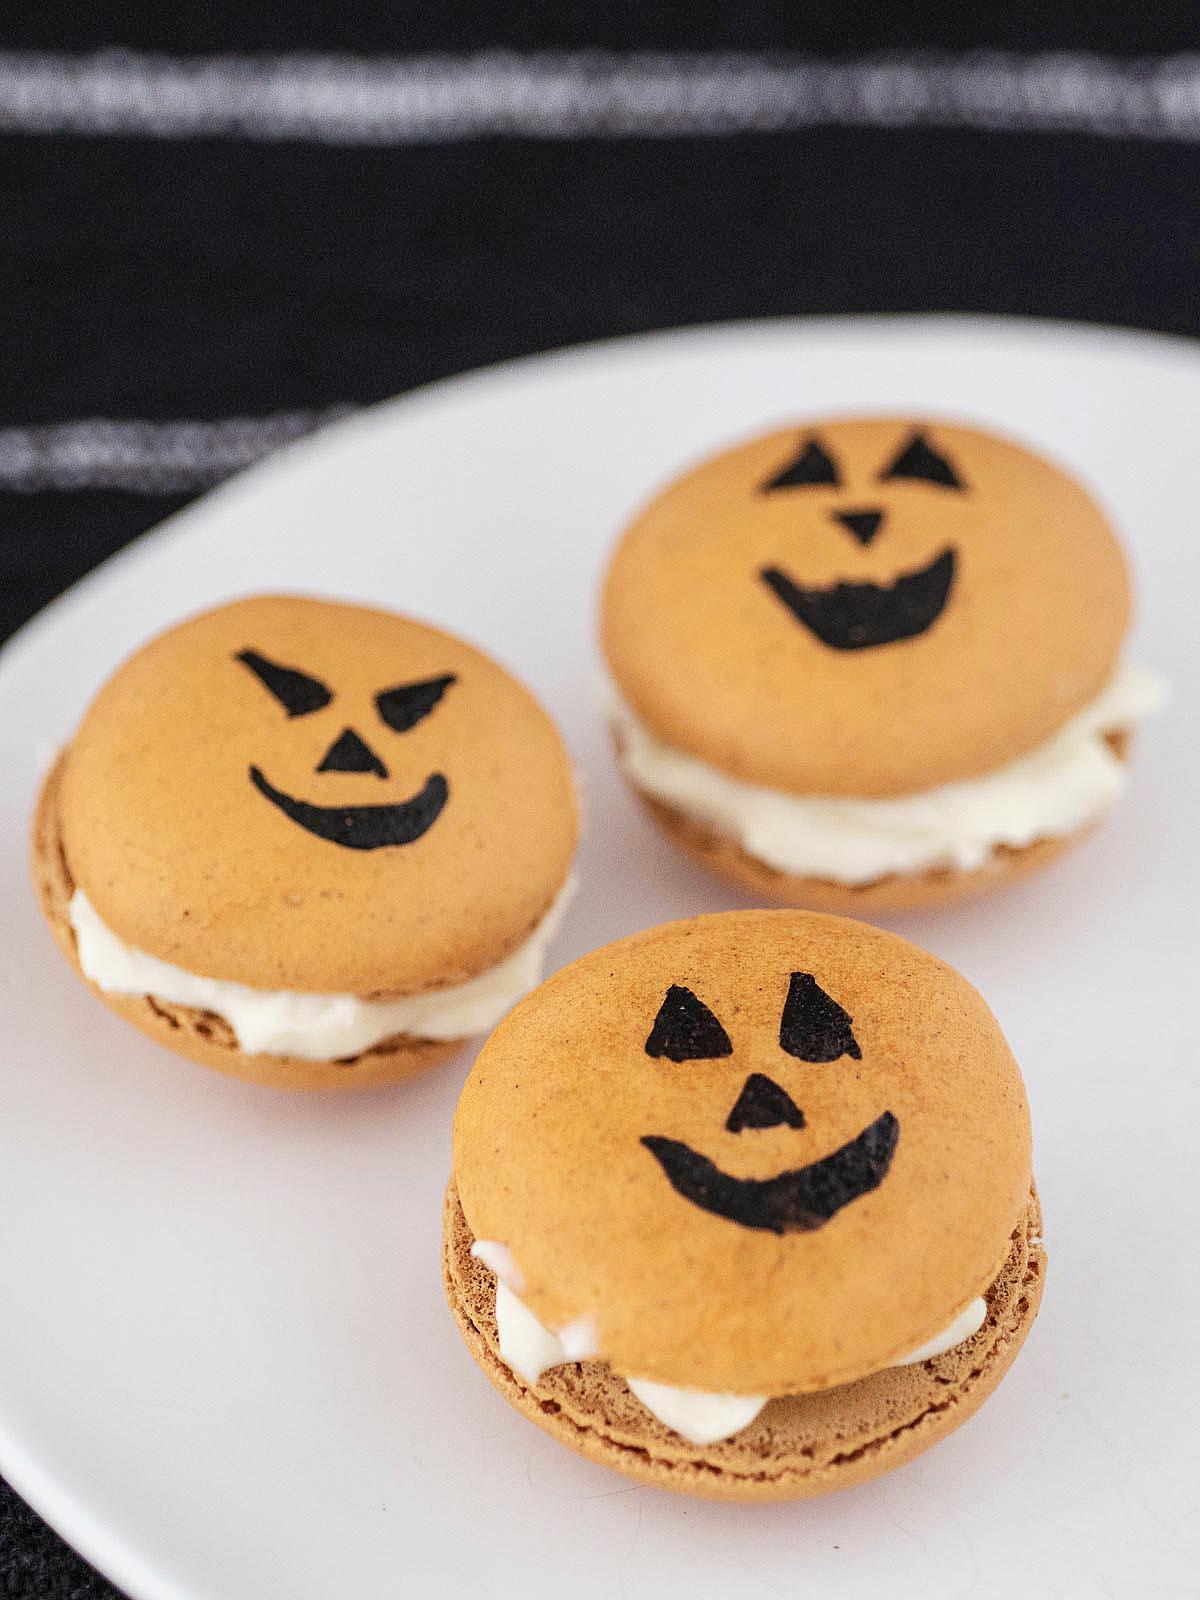 Three Halloween macarons on a white plate.